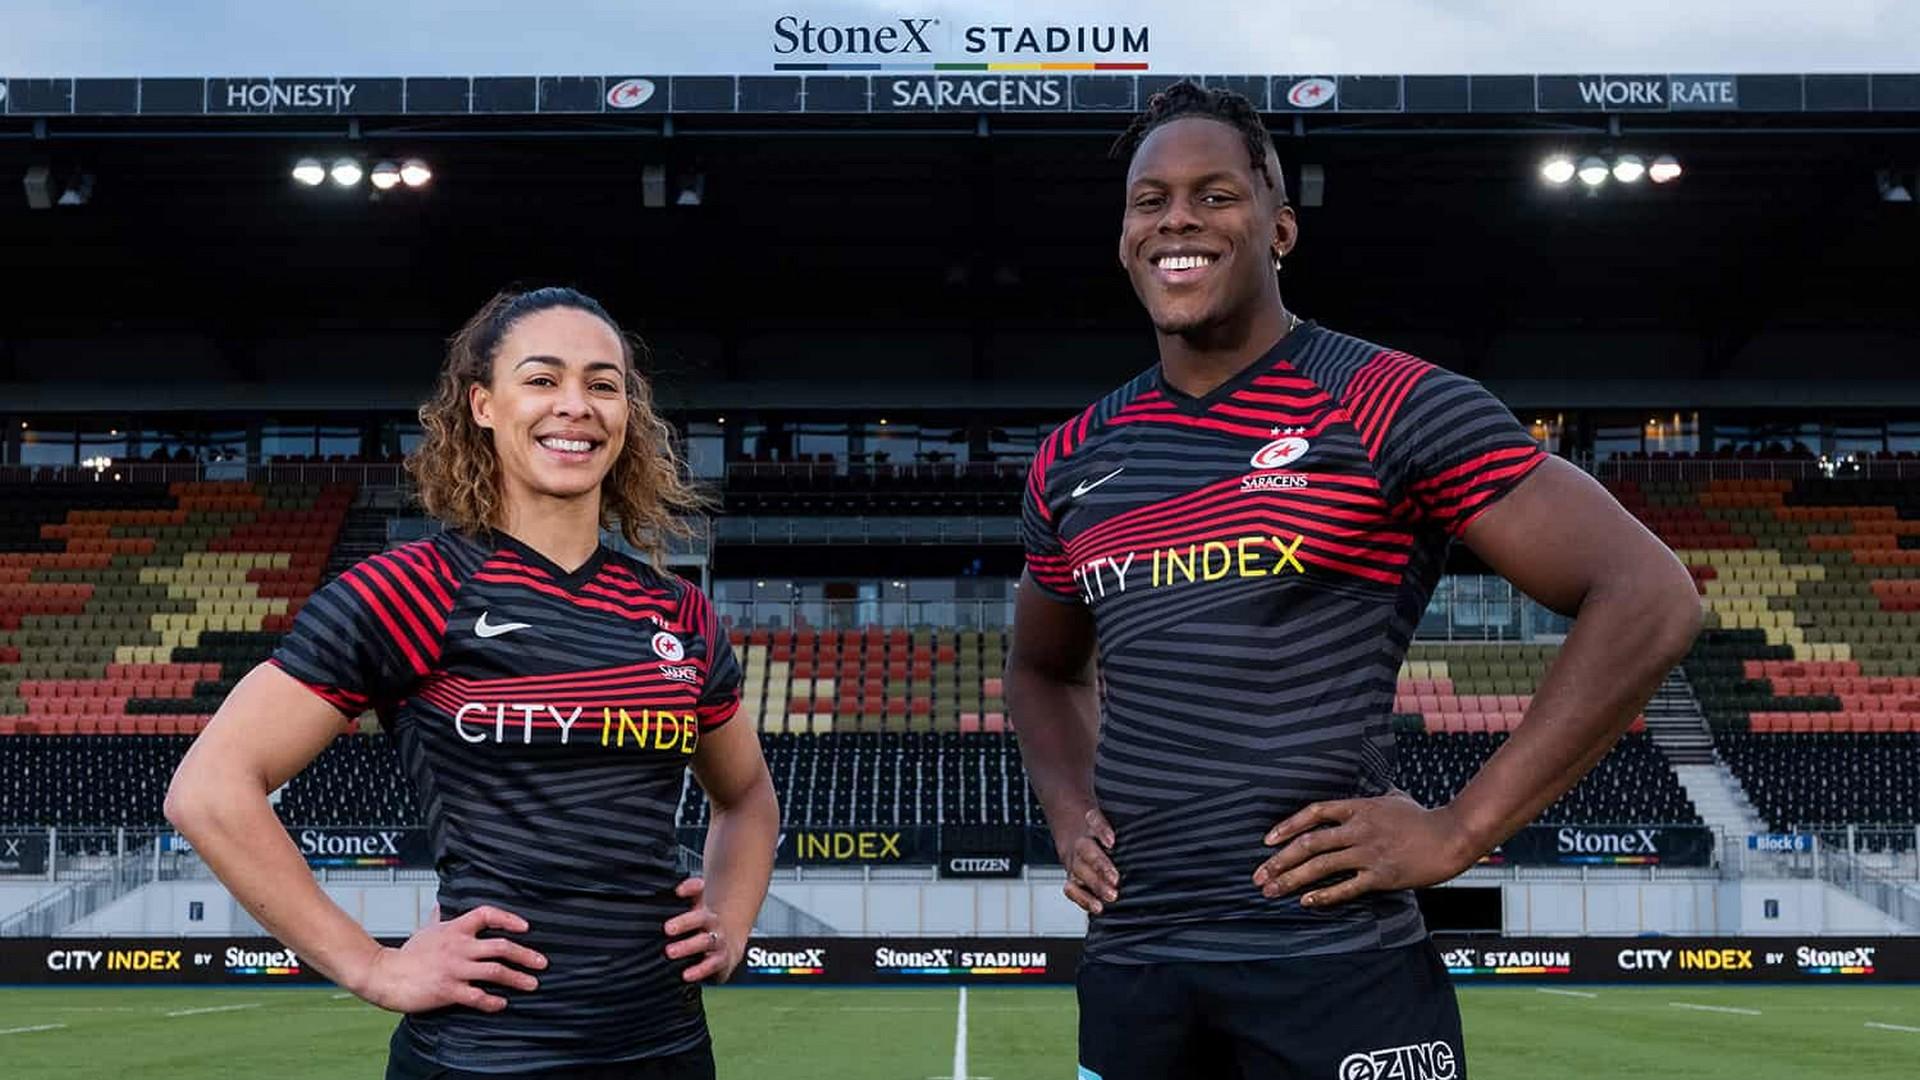 StoneX x Saracens (rugby) 2021